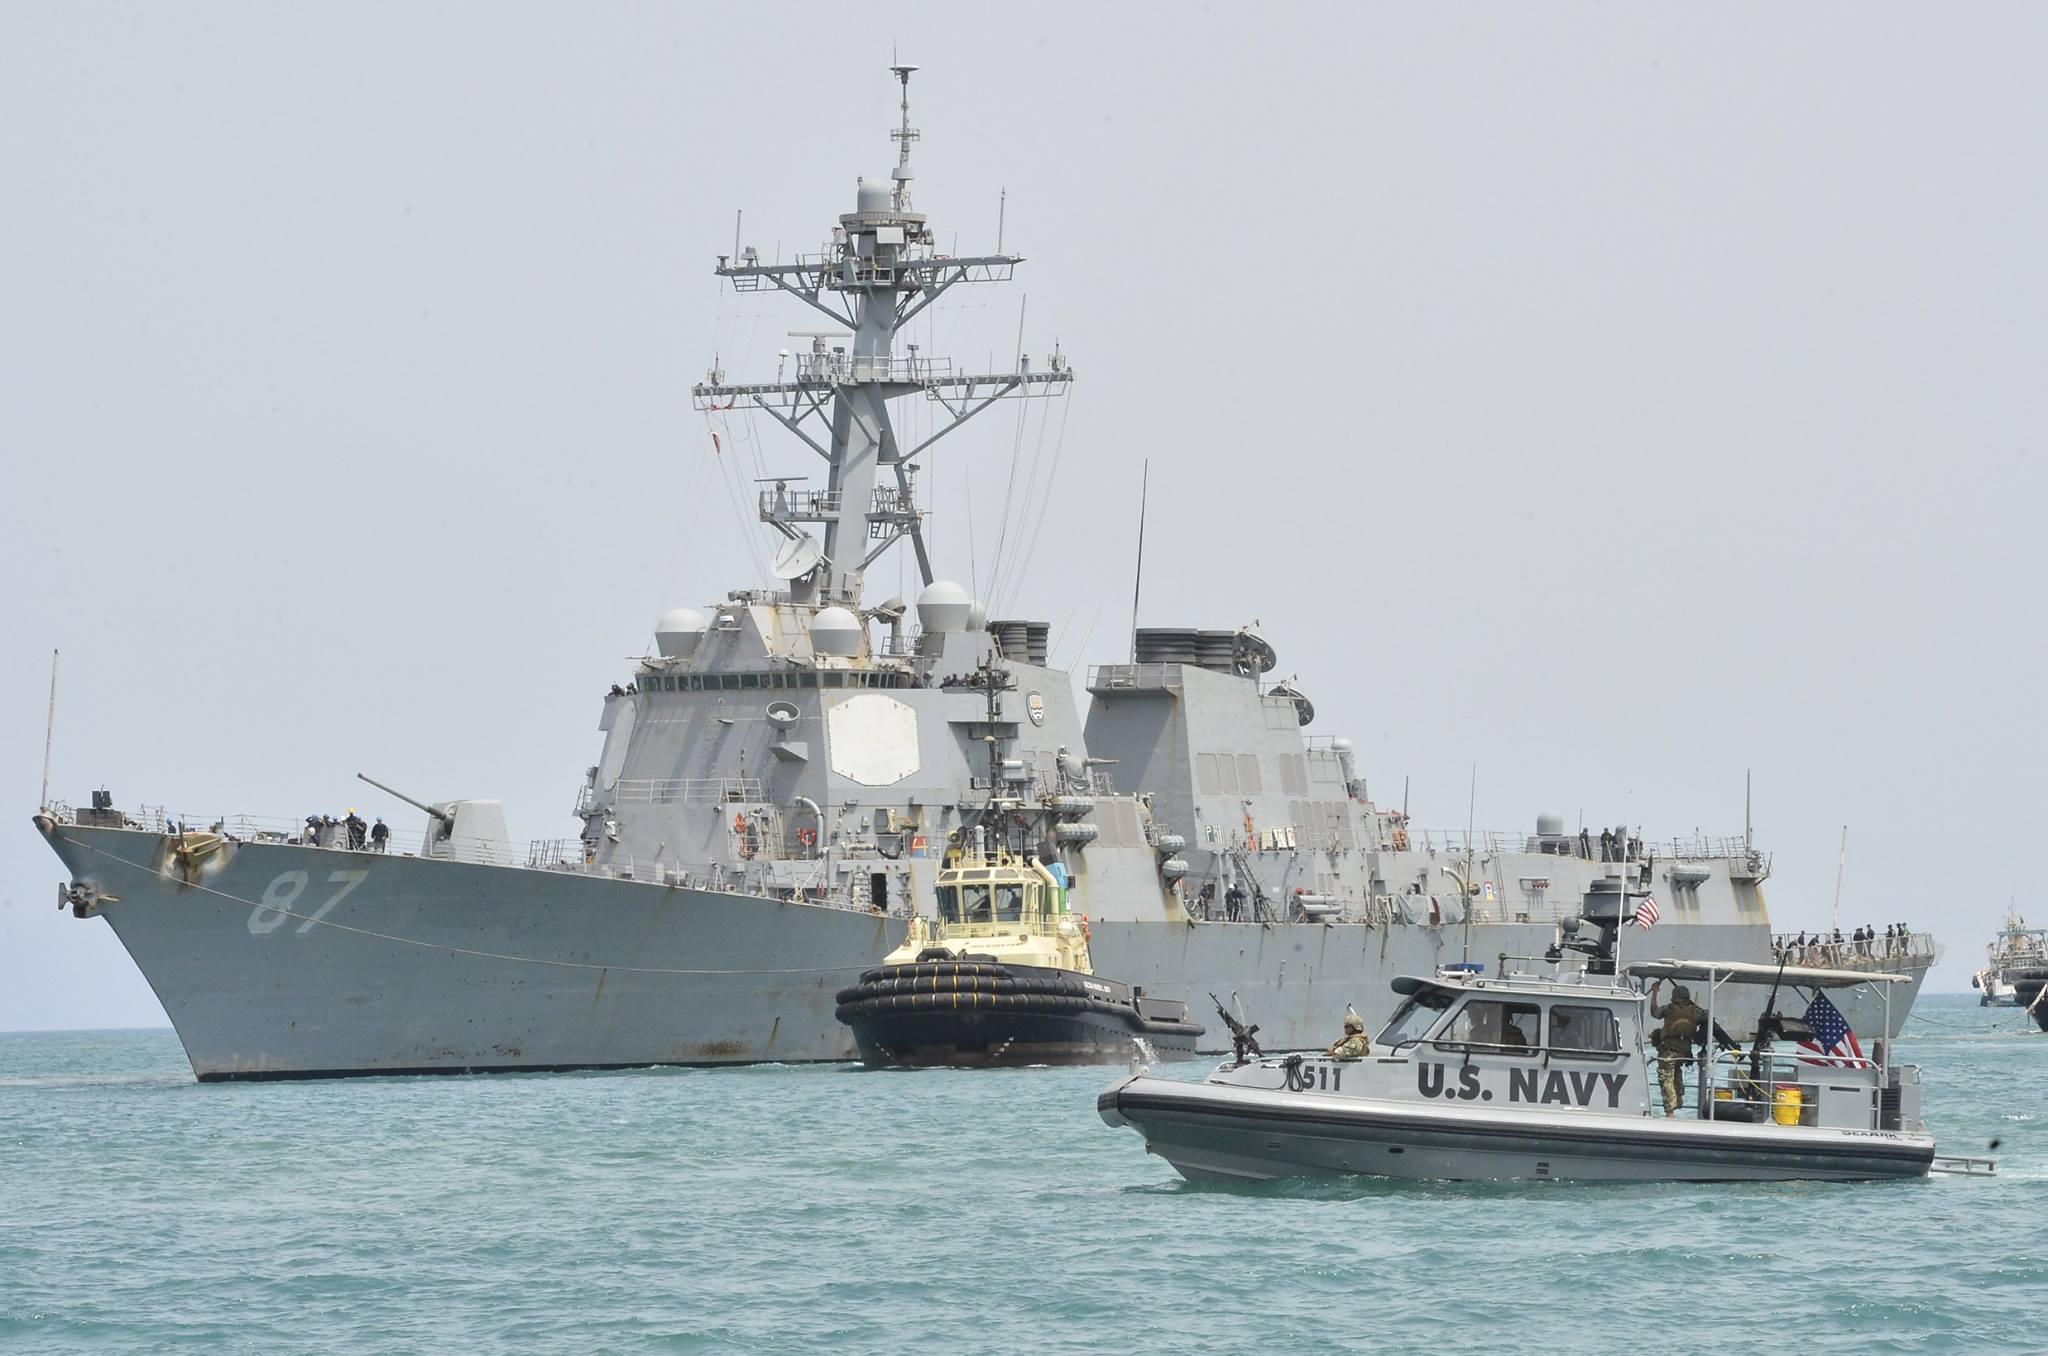 USS Mason (DDG-87) pulls into the Port of Djibouti escorted by Coastal Riverine Squadron 8 Sea Ark patrol boats on July 23, 2016. US Navy Photo